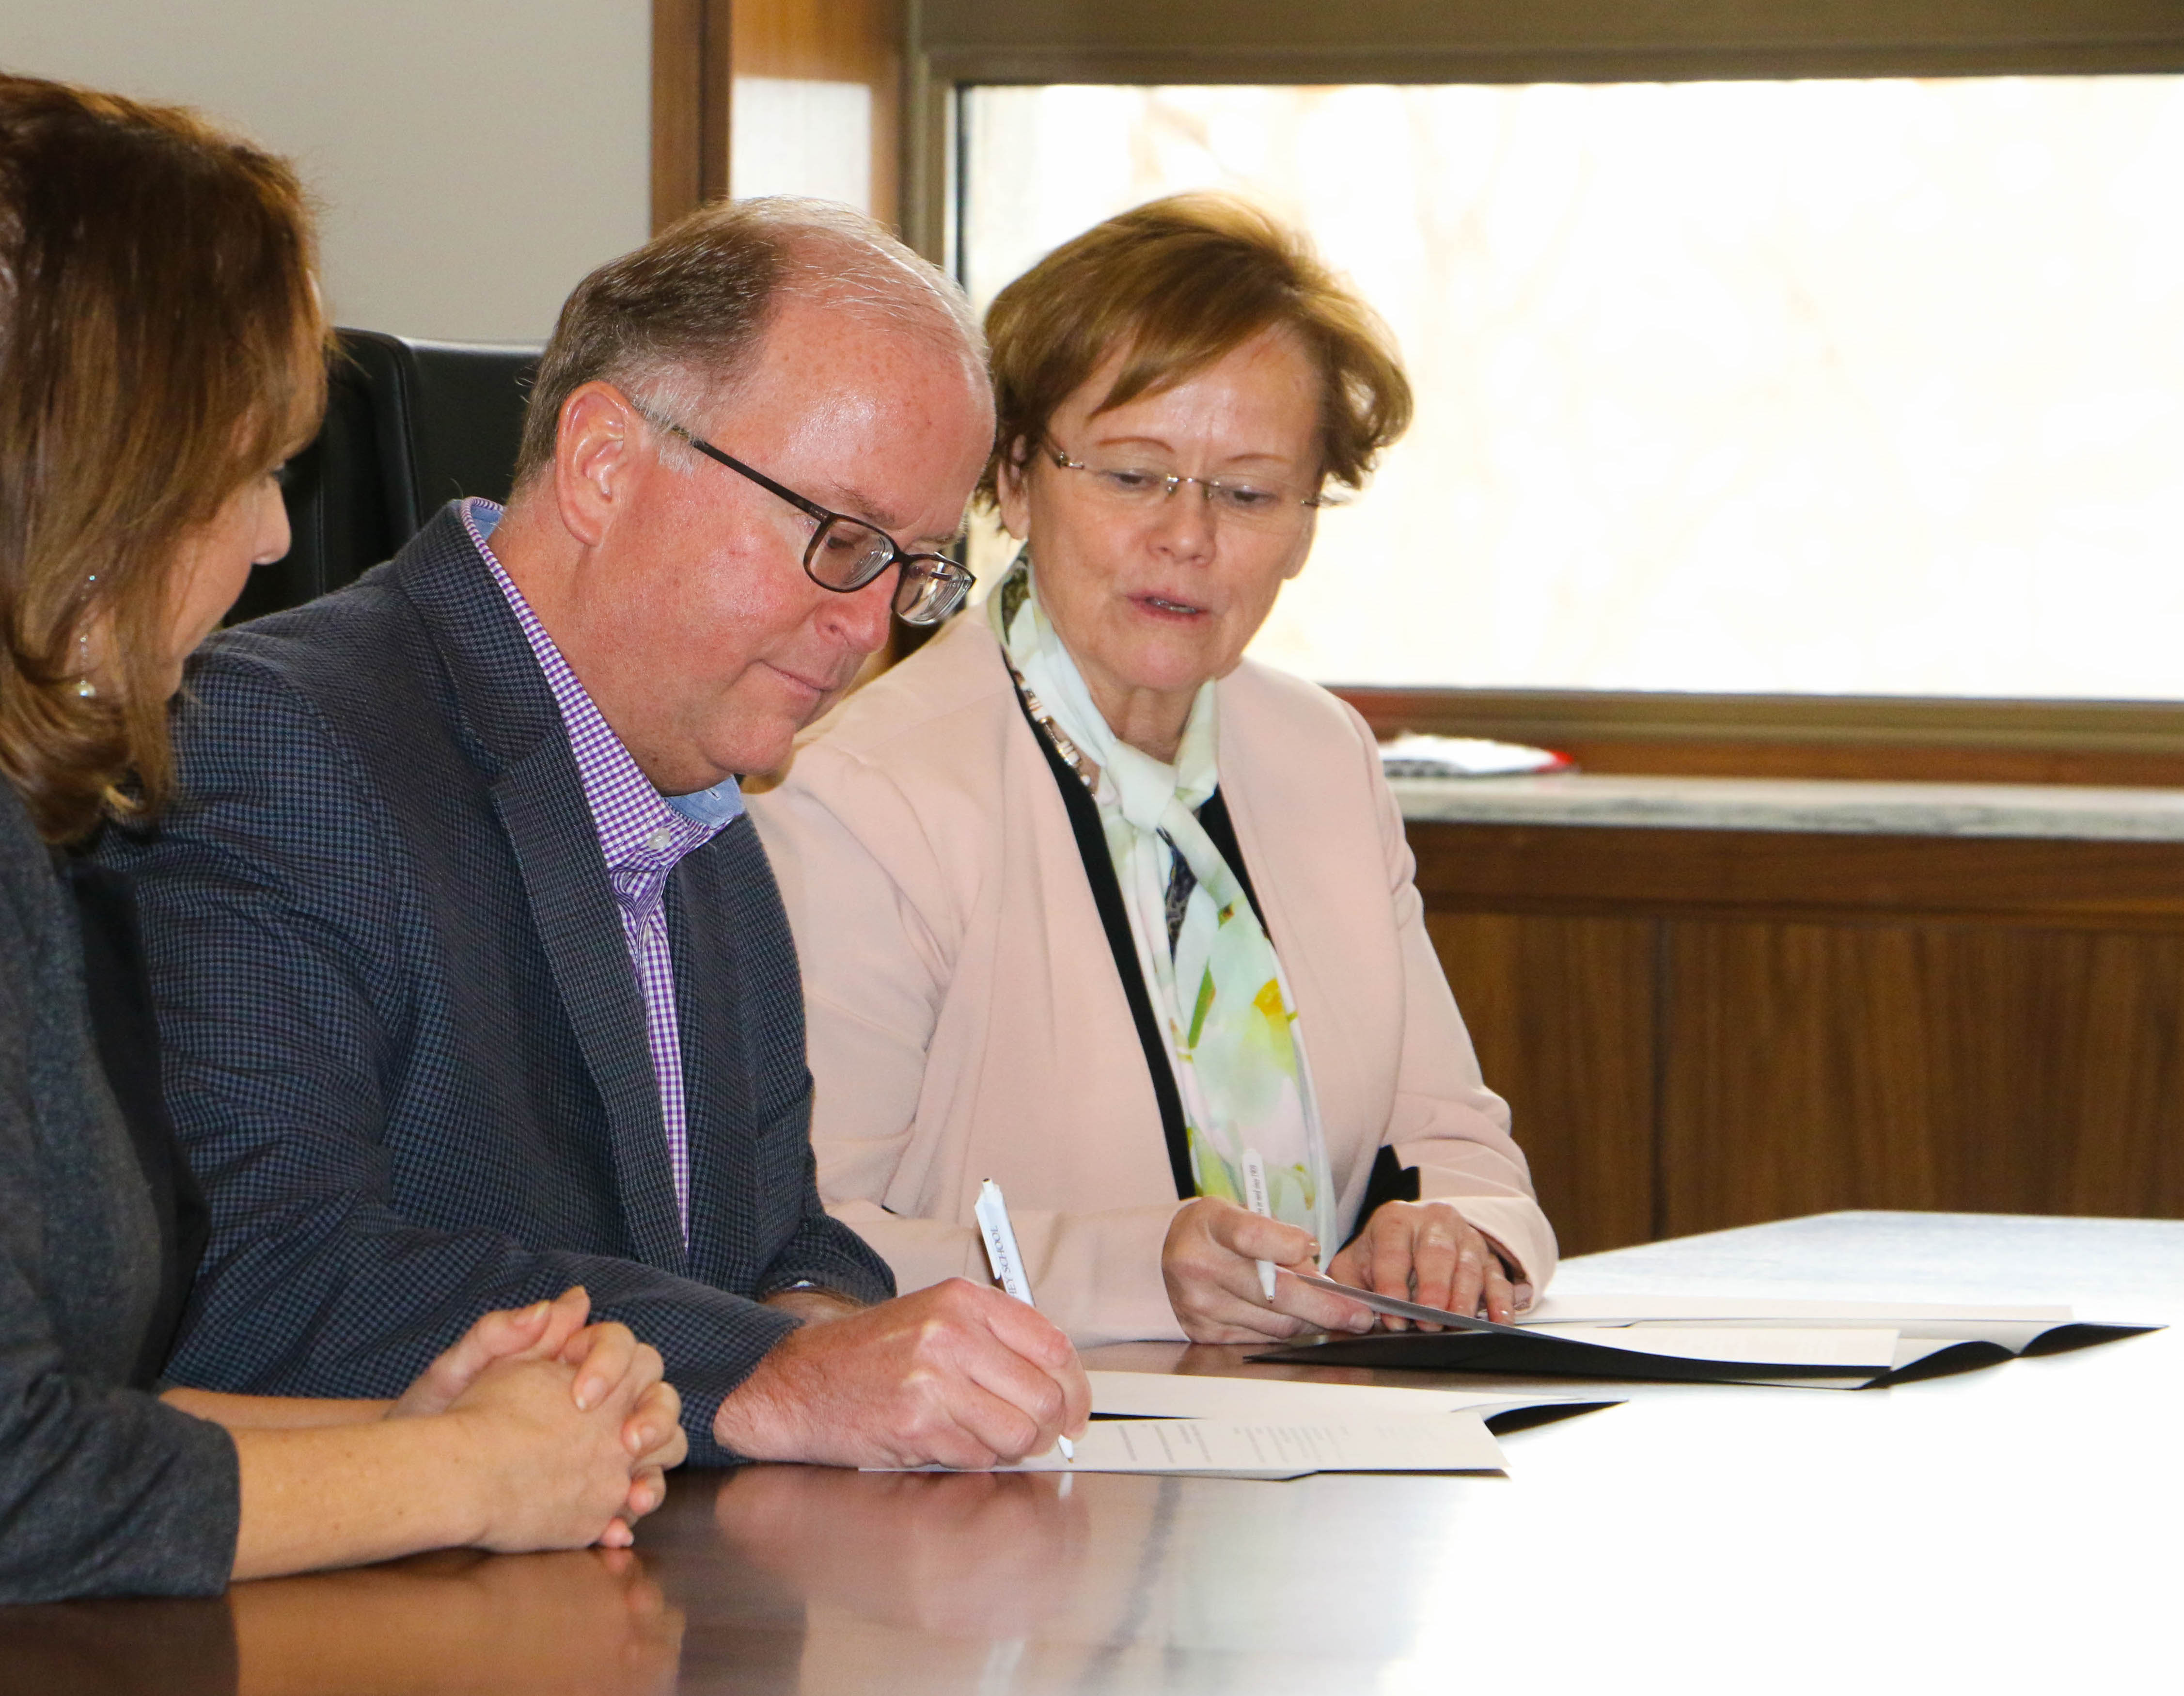 Milton Hershey School signed a Memorandum of Understanding with Dickinson College.